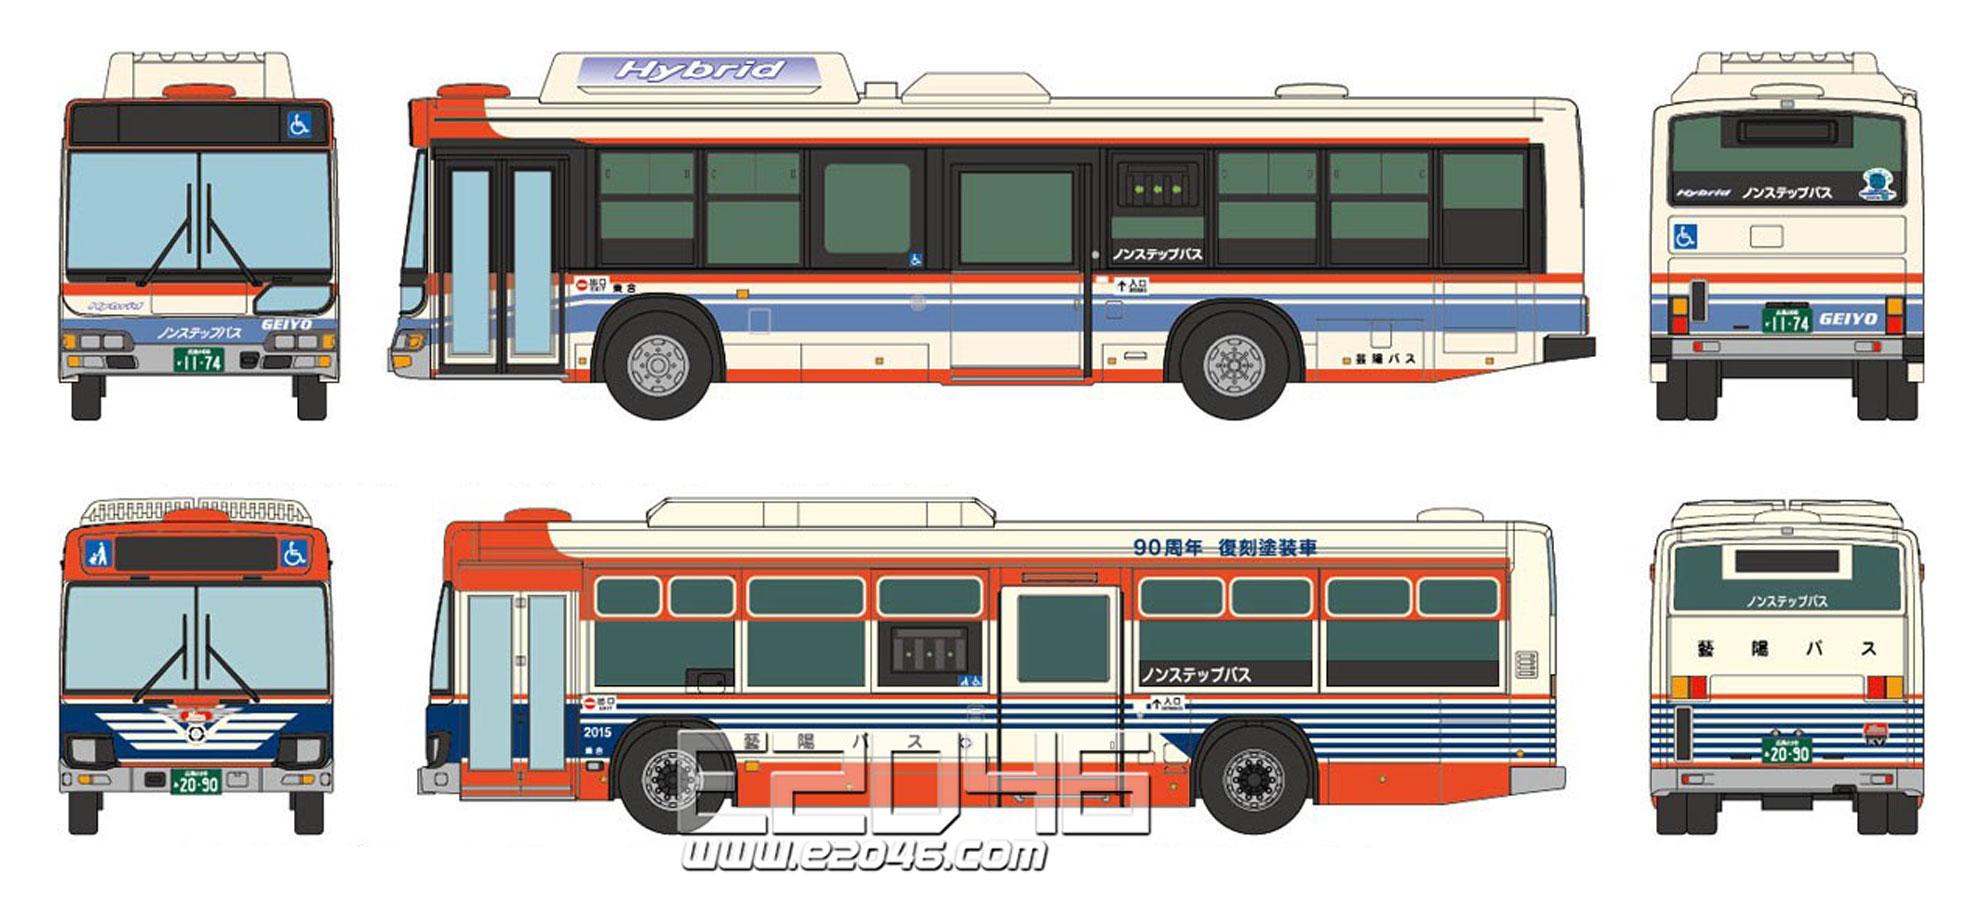 Geiyo Bus 90th Anniversary of the Establishment 2 Car Set